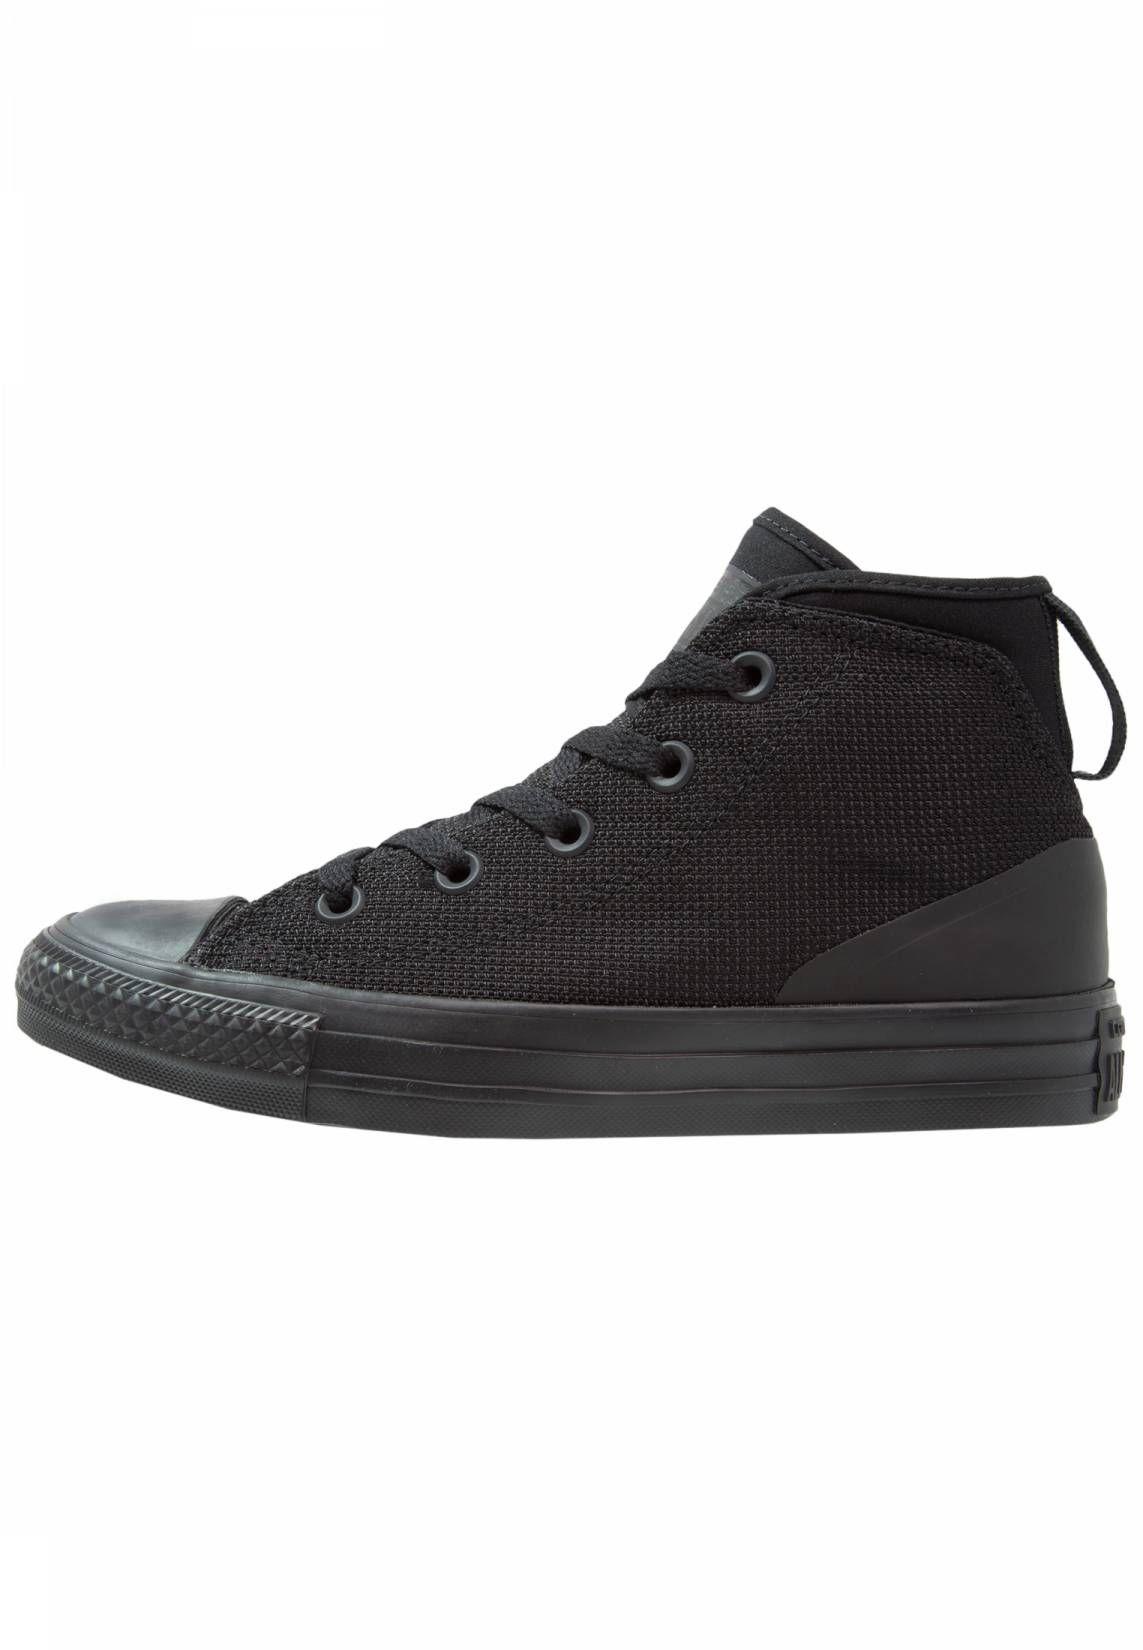 Converse. SYDE STREET Sneakers alte black. Fodera:senza